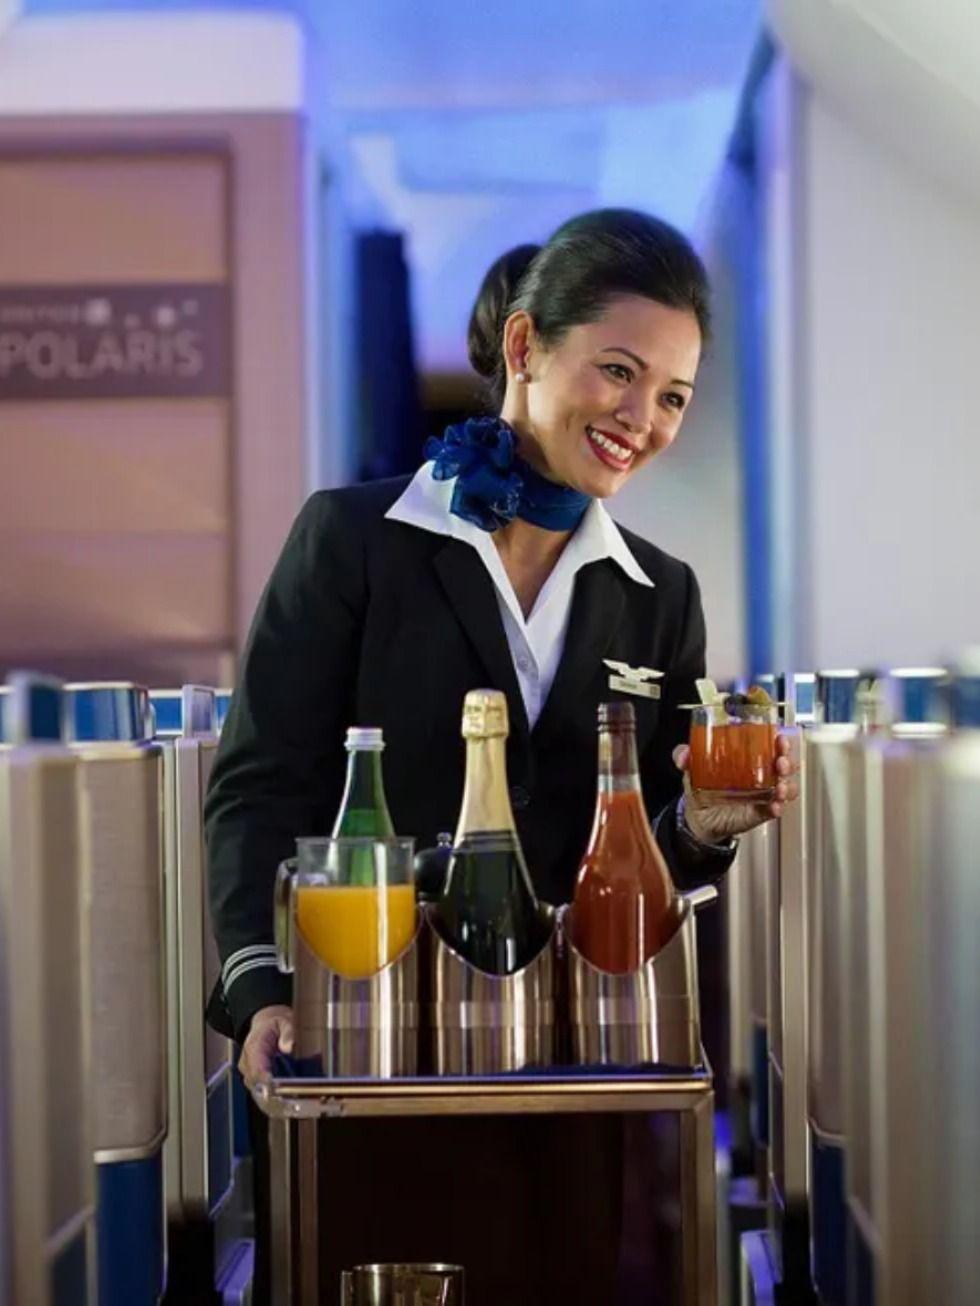 United Airlines Flight Attendant United Airlines Flight Attendant Airline Flights